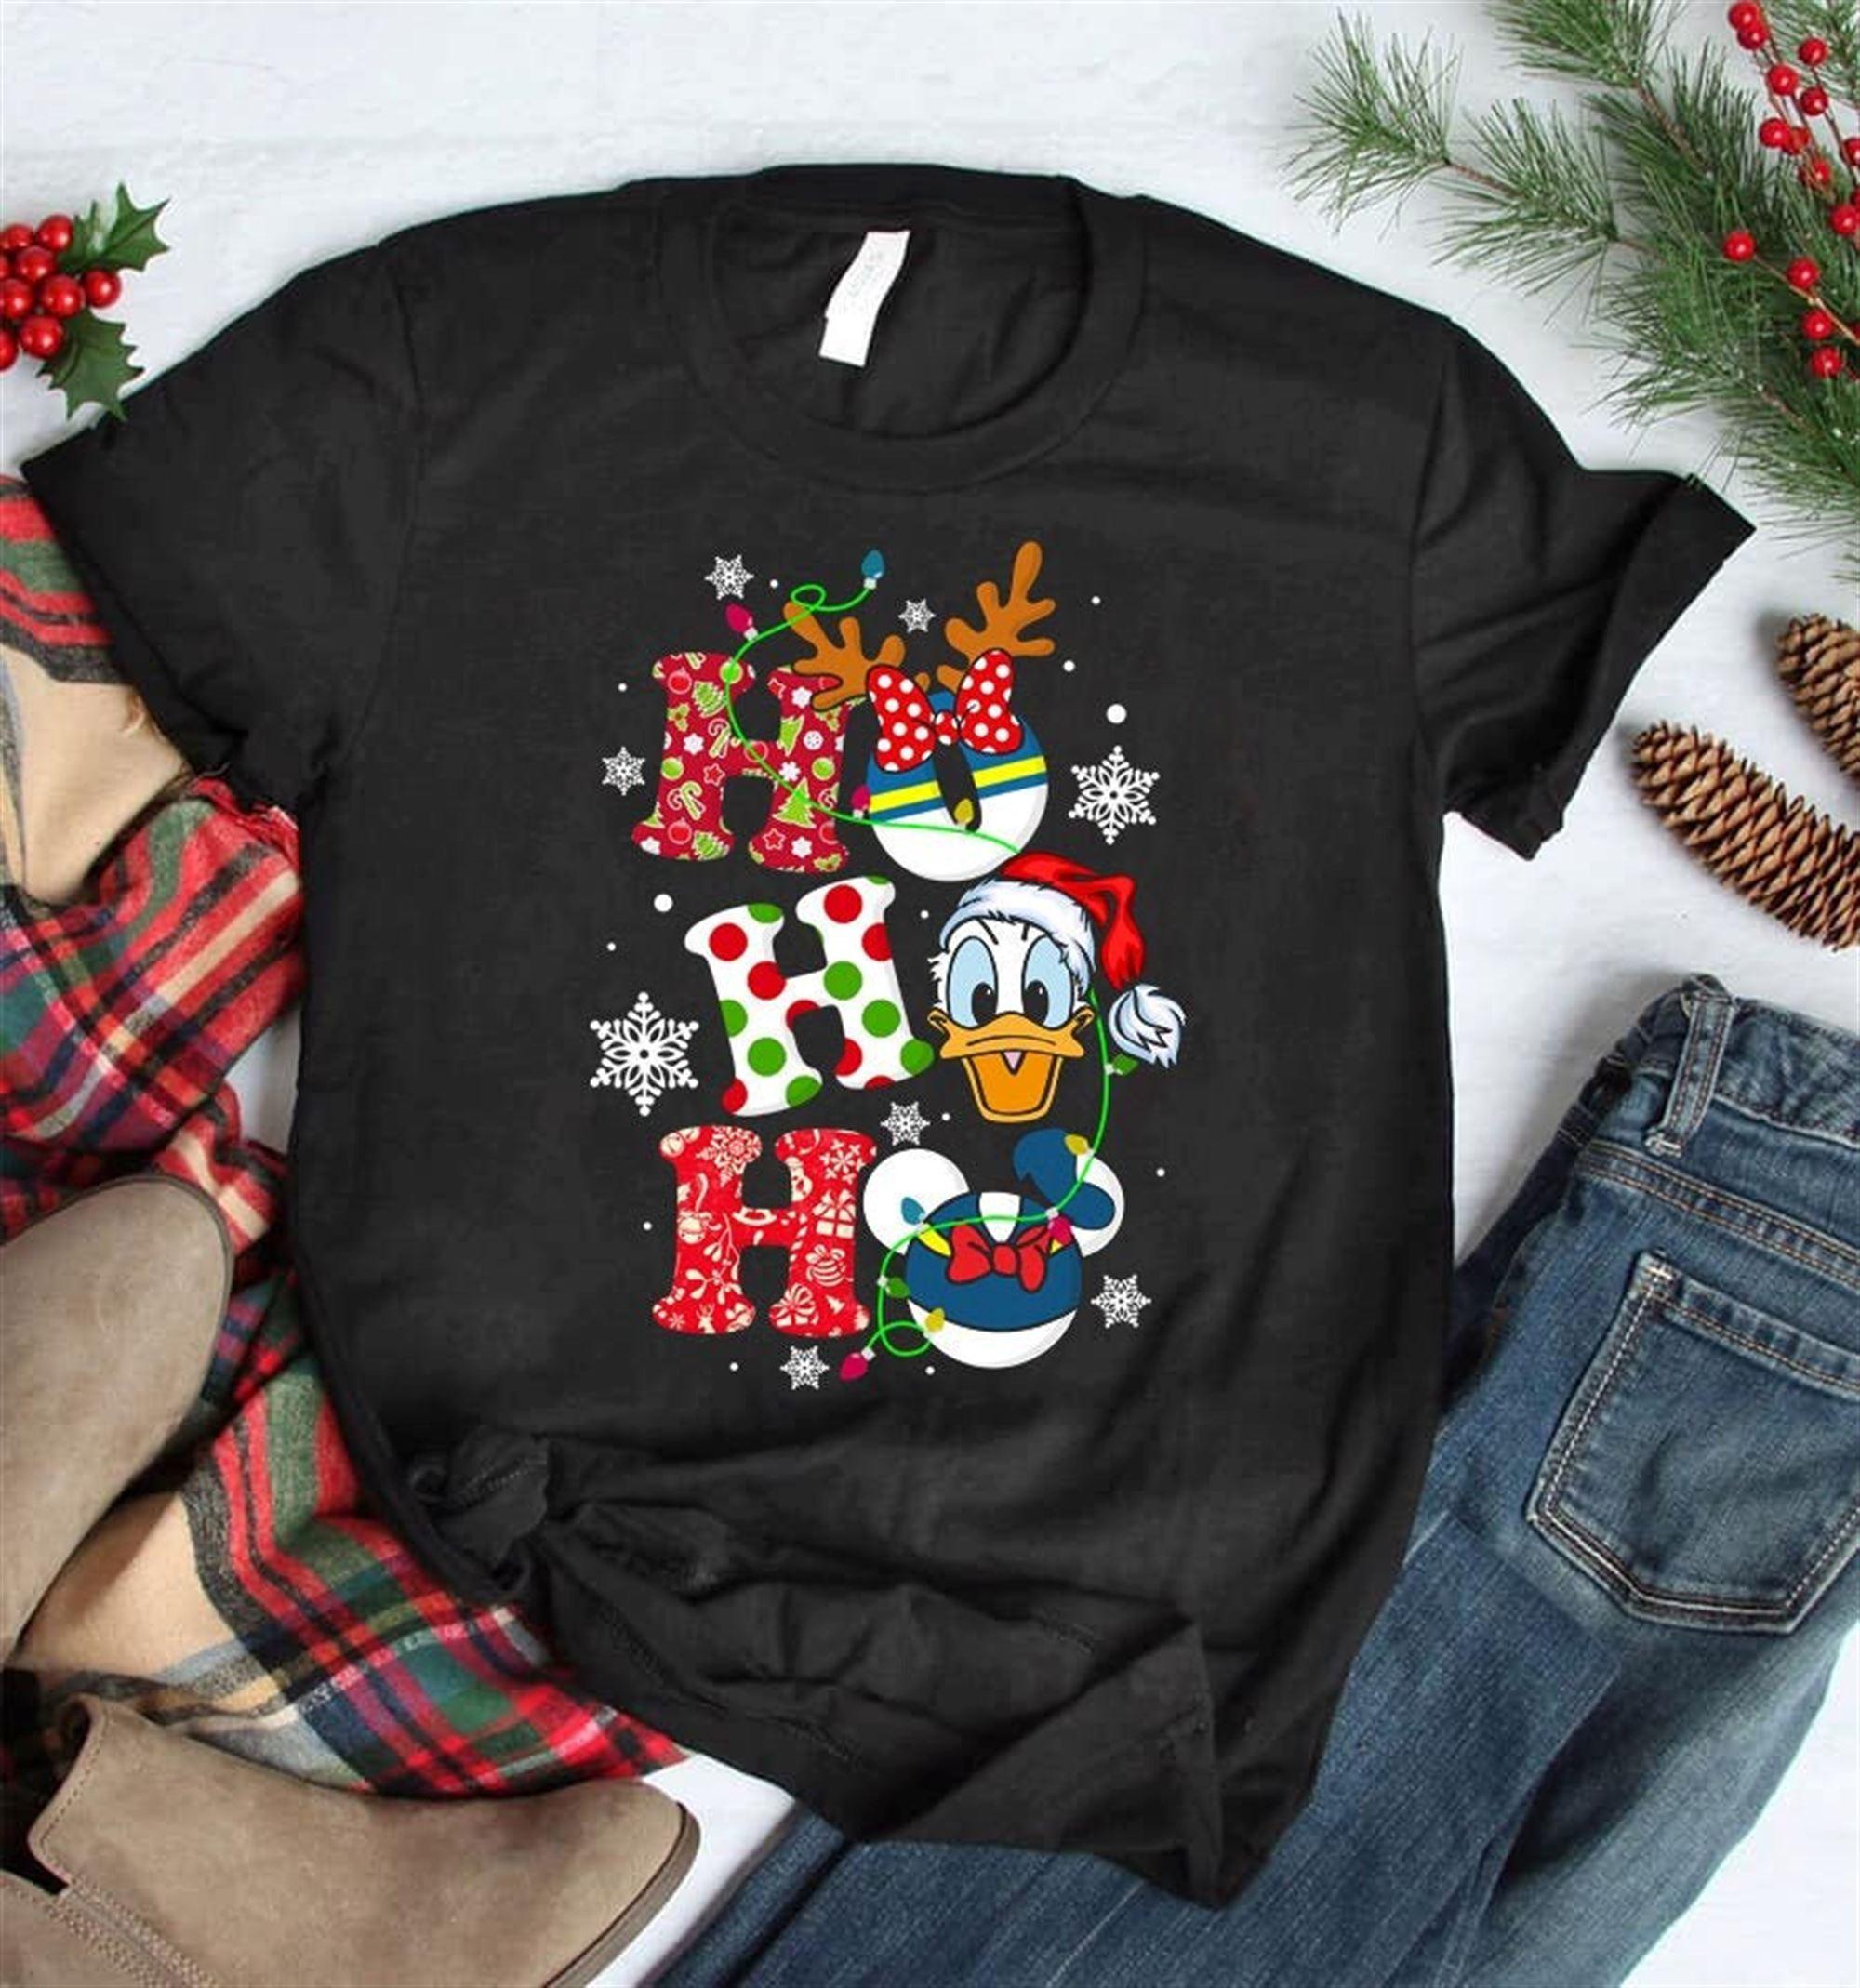 Ho Ho Ho Donald Duck Christmas Shirt Cute Christmas Disney Sweatshirt Hoodie Christmas Gifts Snowmen Snowflake Santa Hat Reindeer